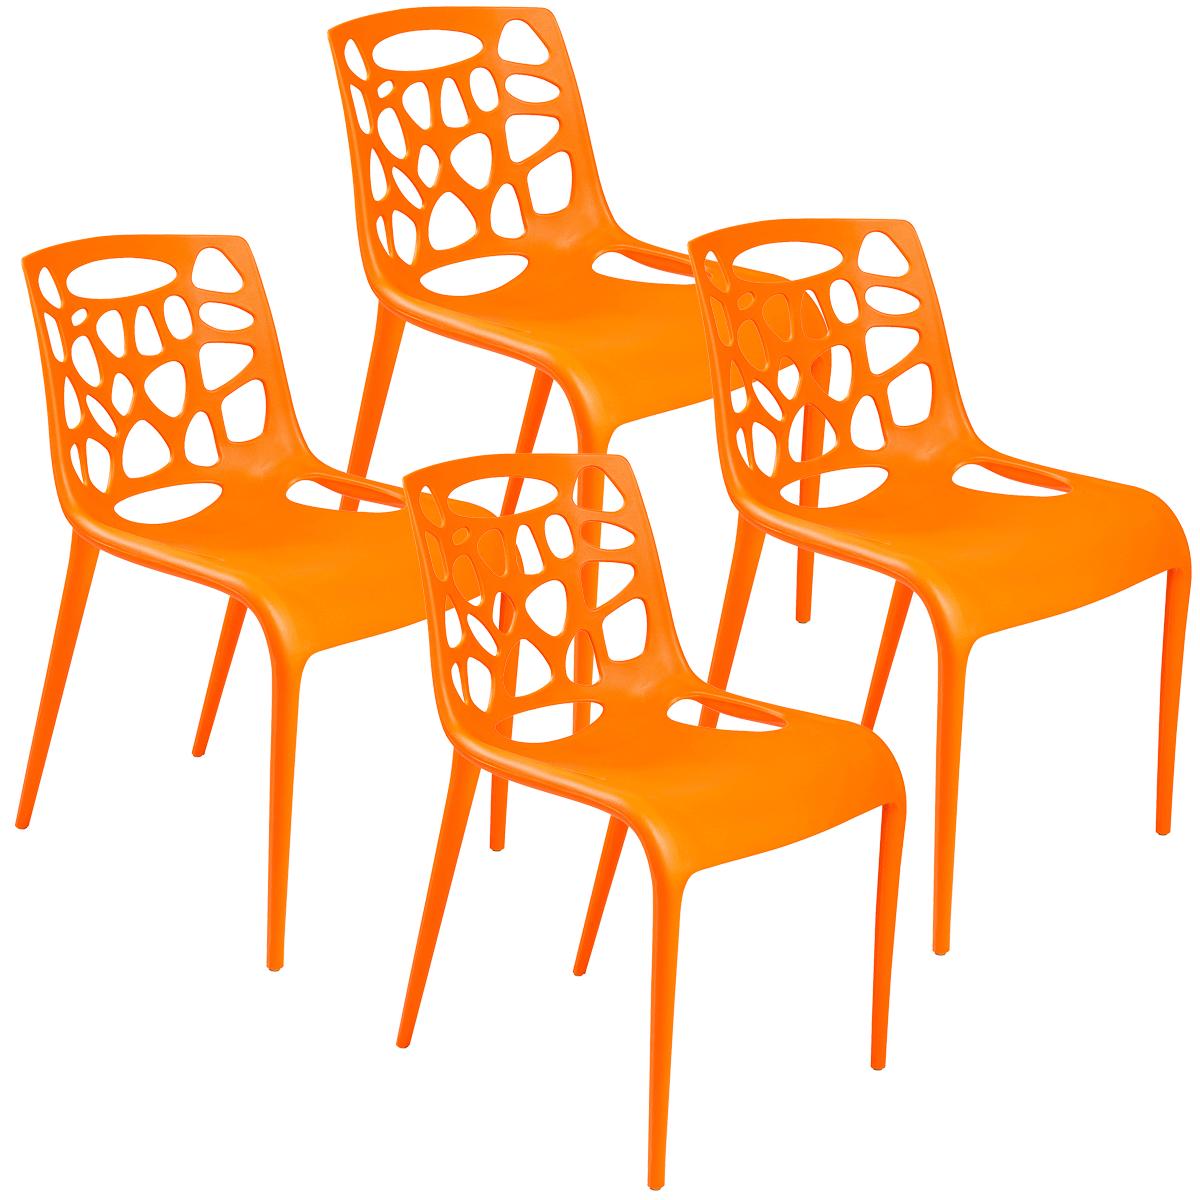 Kit Cadeiras Giovana Kalmar Nara 4x - Diversas Cores - Lote 2015